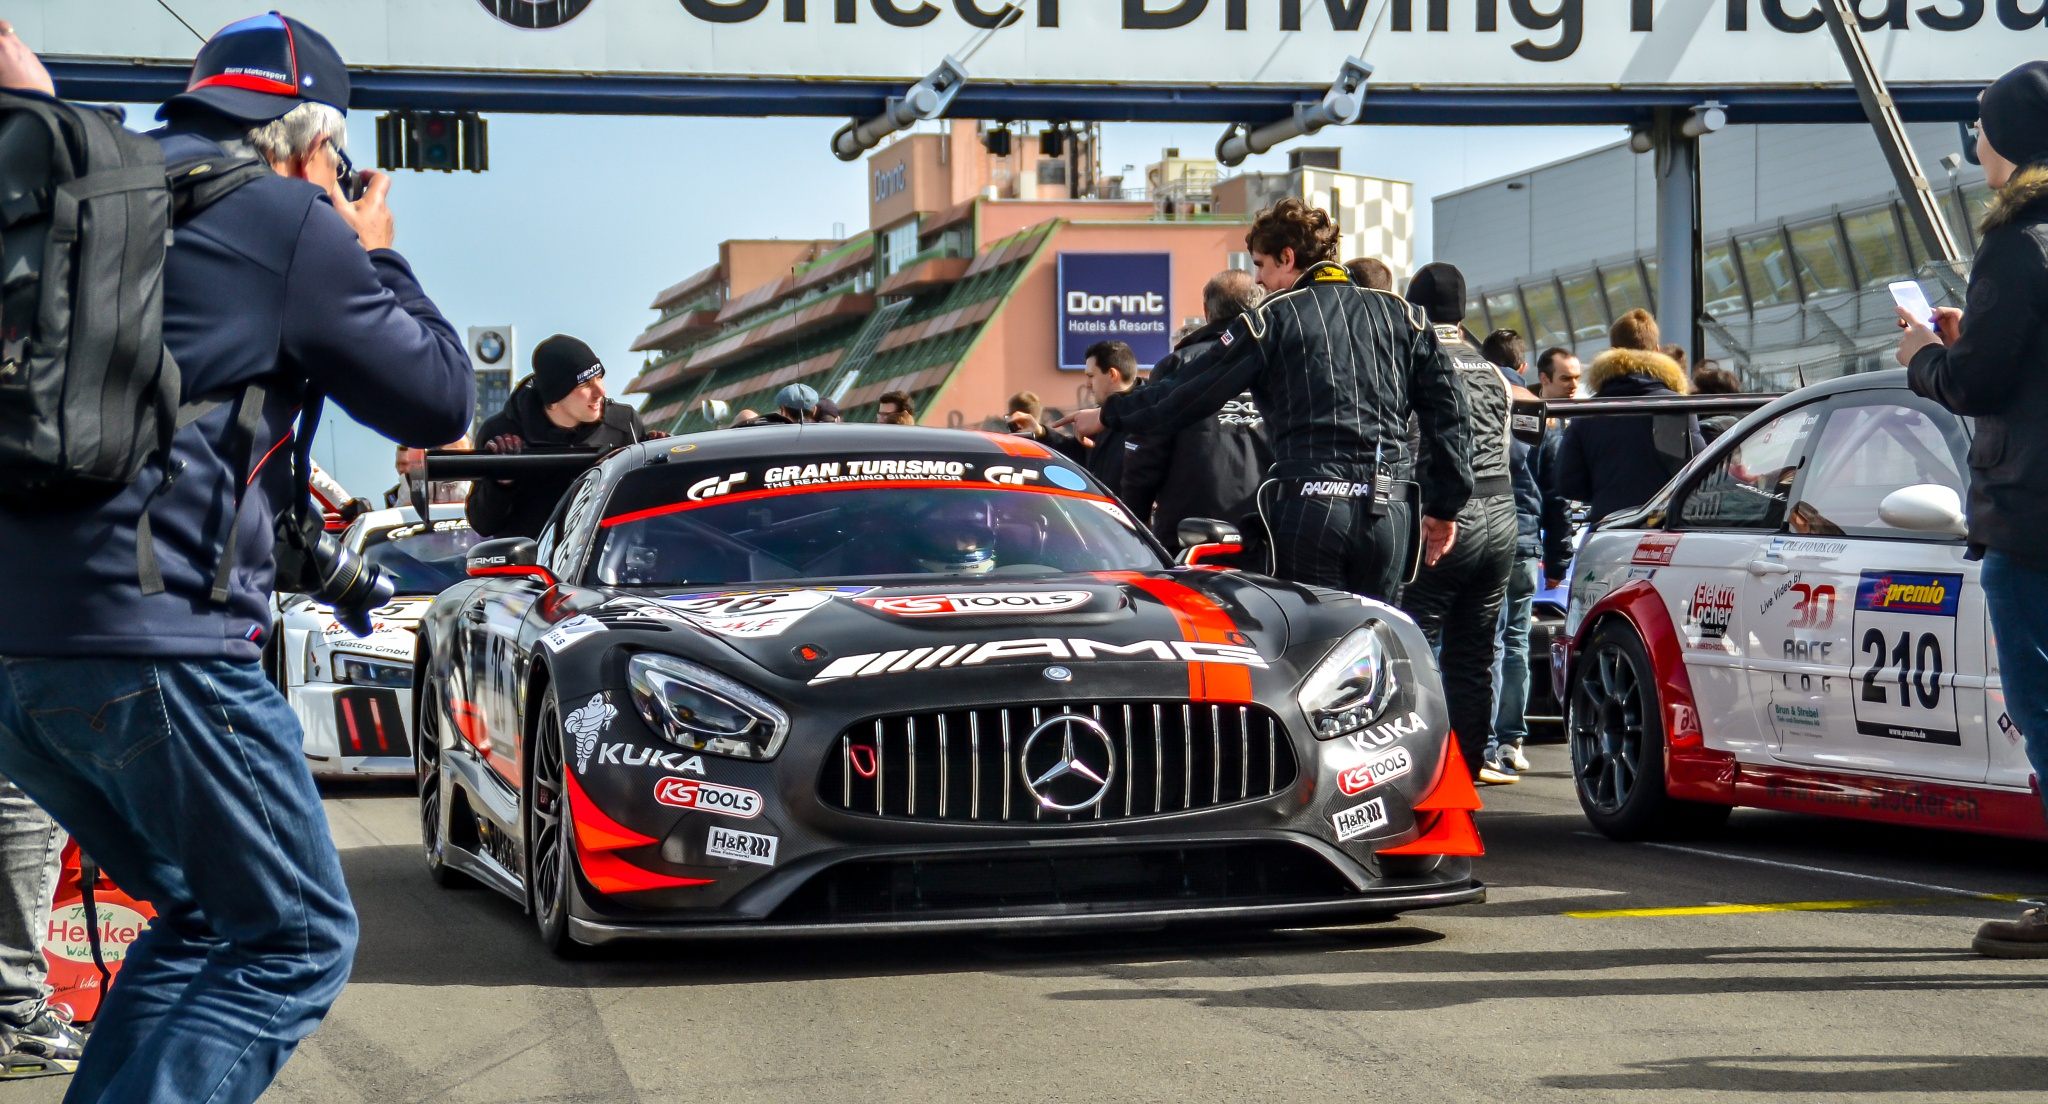 Mercedes_SLS_AMG_GT3 by TheHogrebe